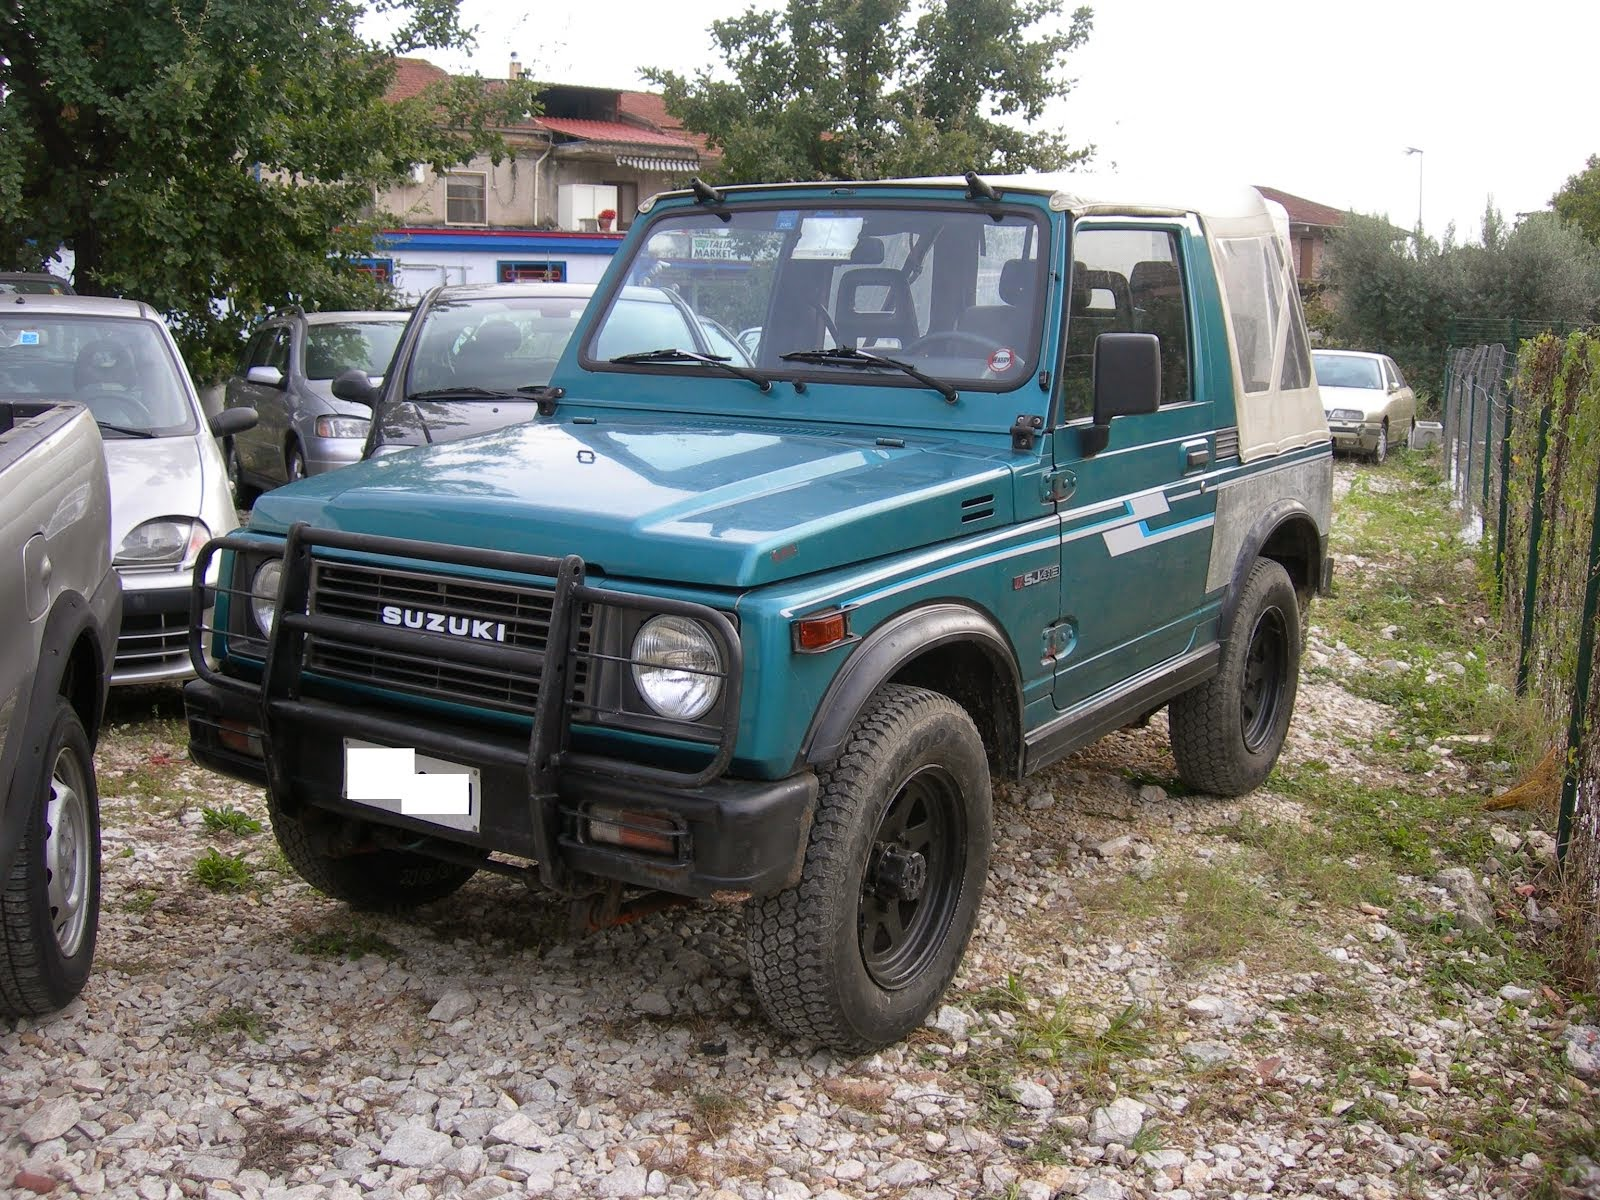 Suzuki Santana 1.3 Benzina 4x4 Cabrio anno 87 4x4 2.800,00 Euro